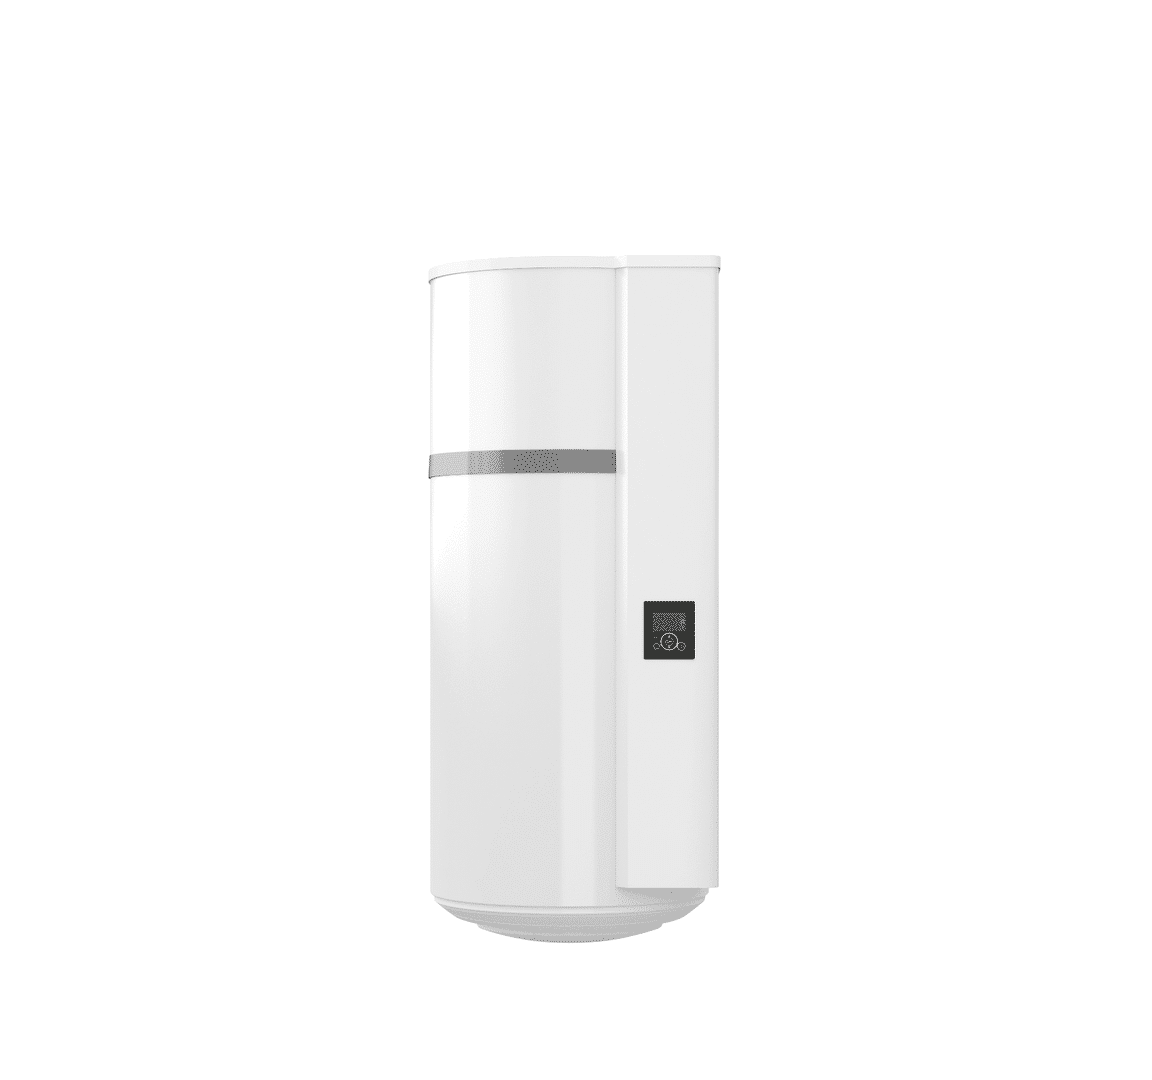 Afbeelding van Panasonic warmwaterboiler (wand)